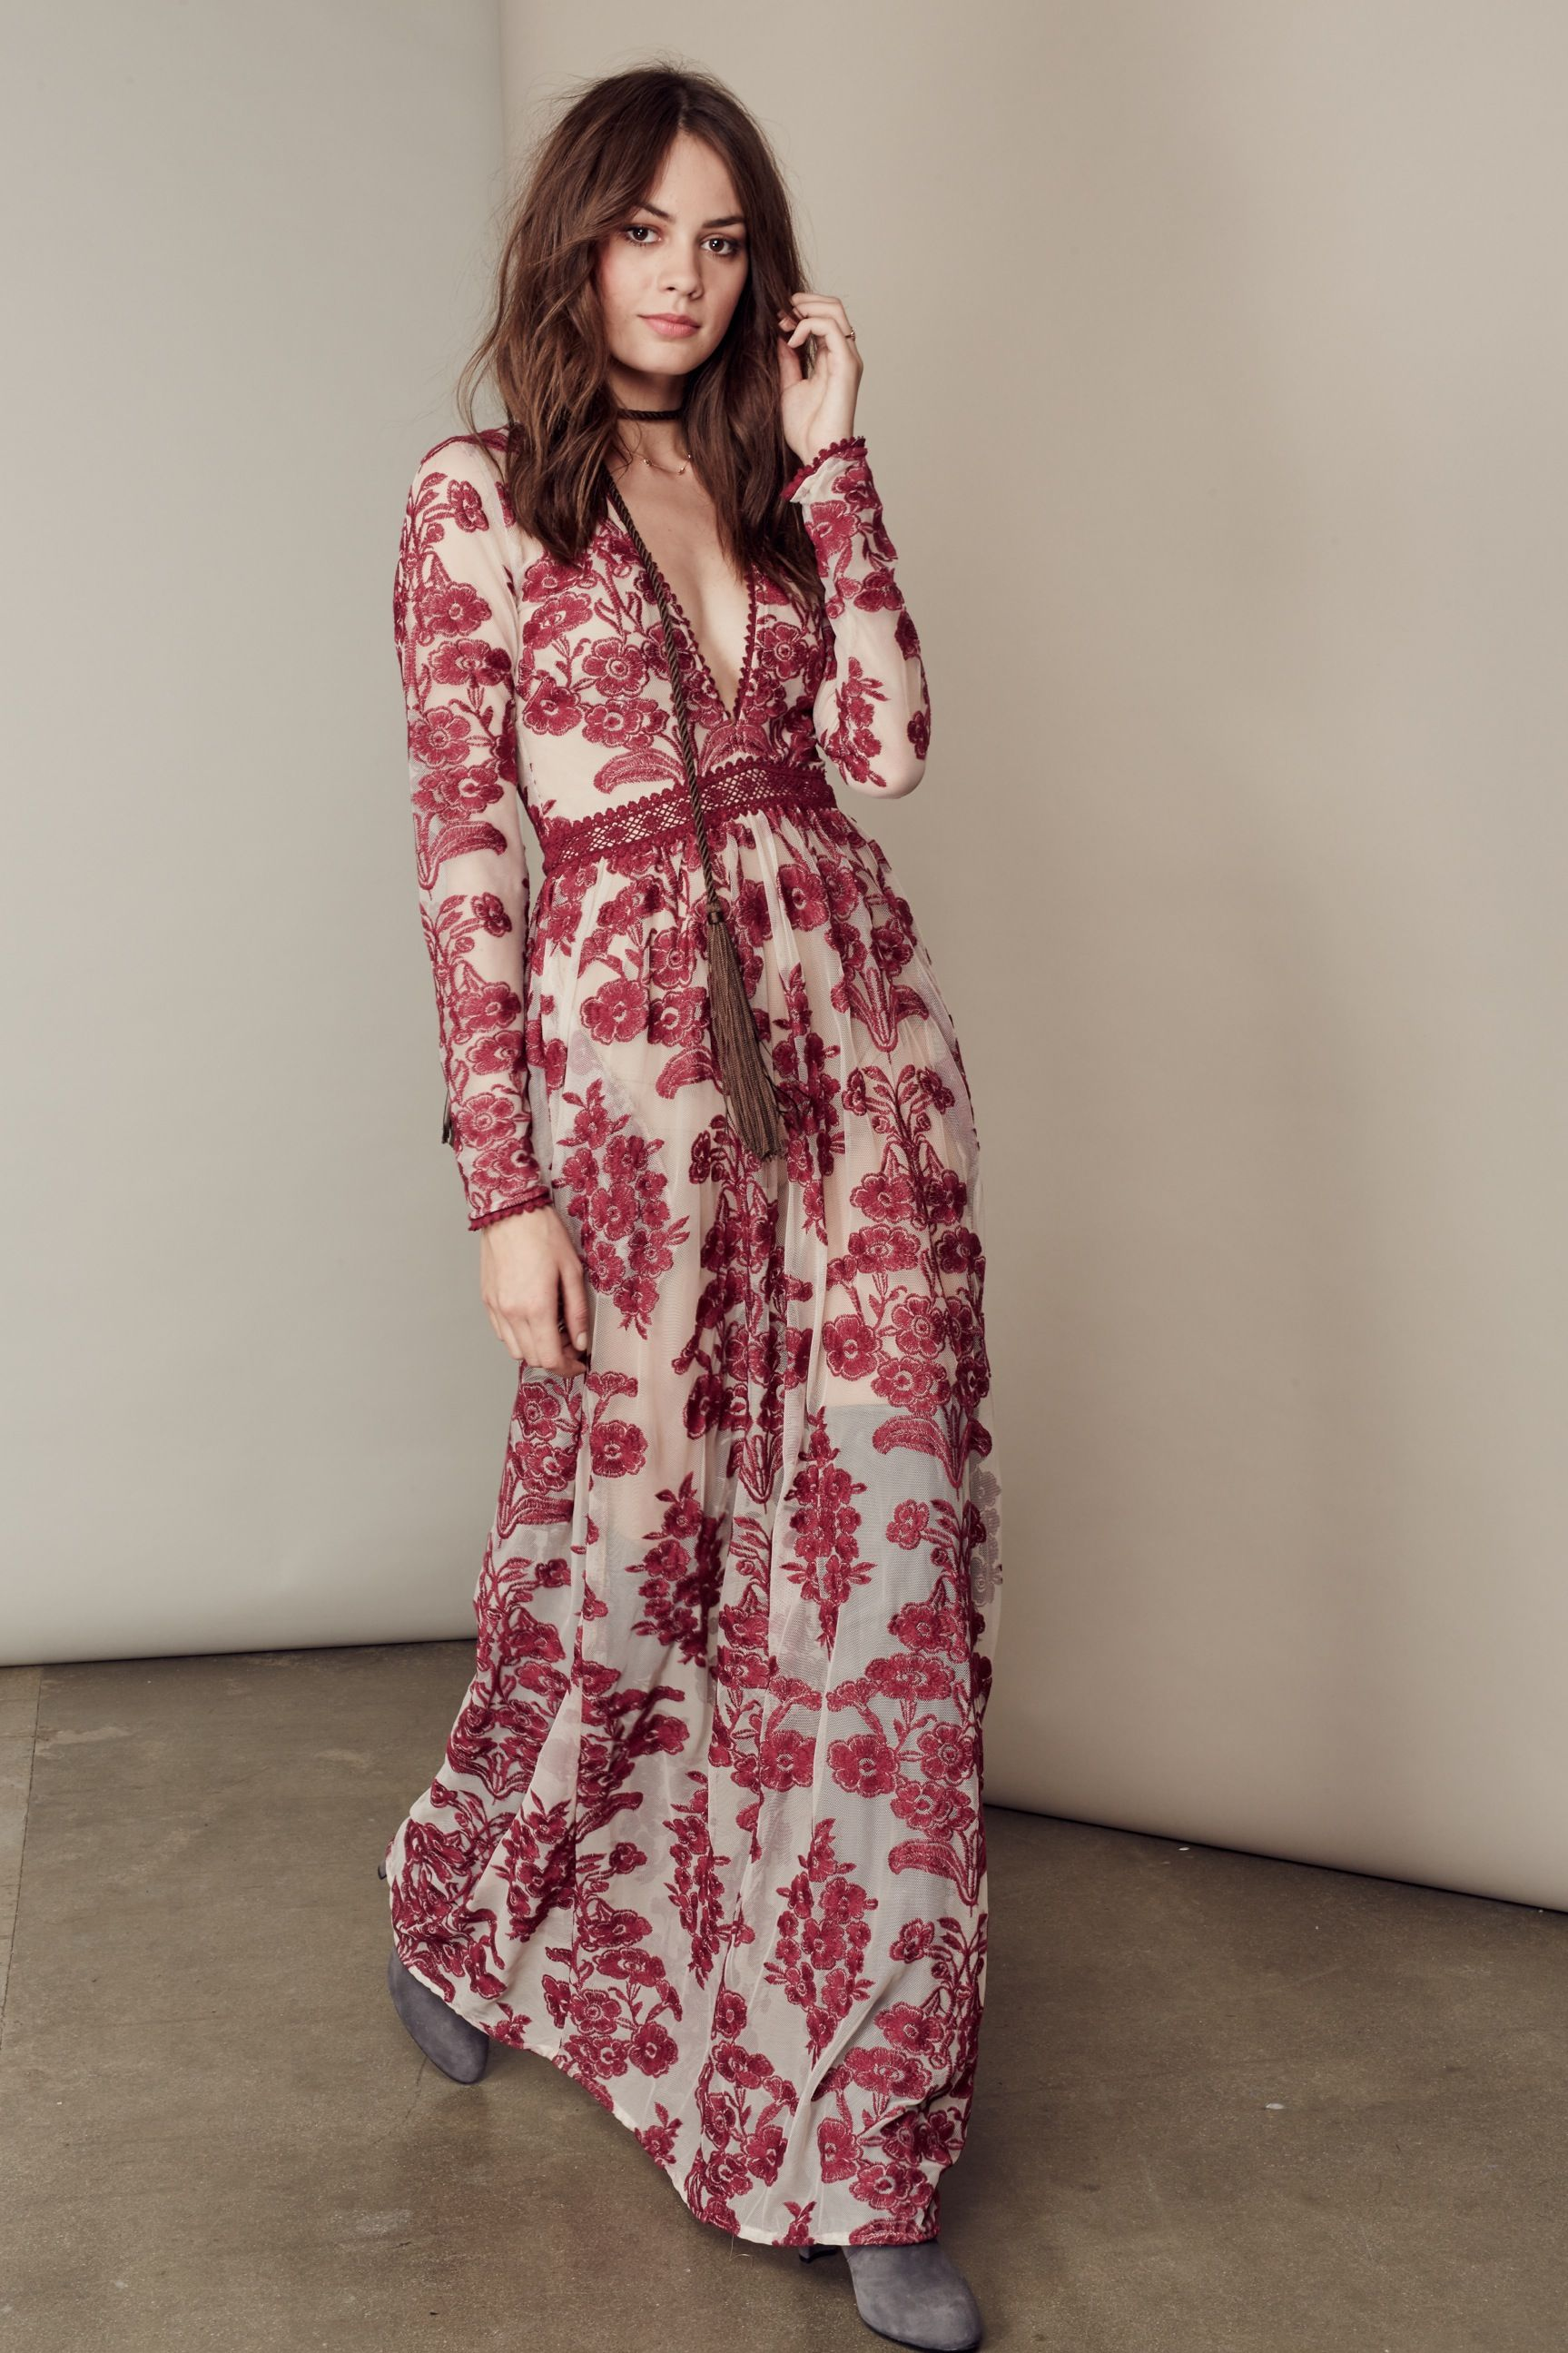 Temecula maxi dress boho pinterest maxi dresses clothes and boho